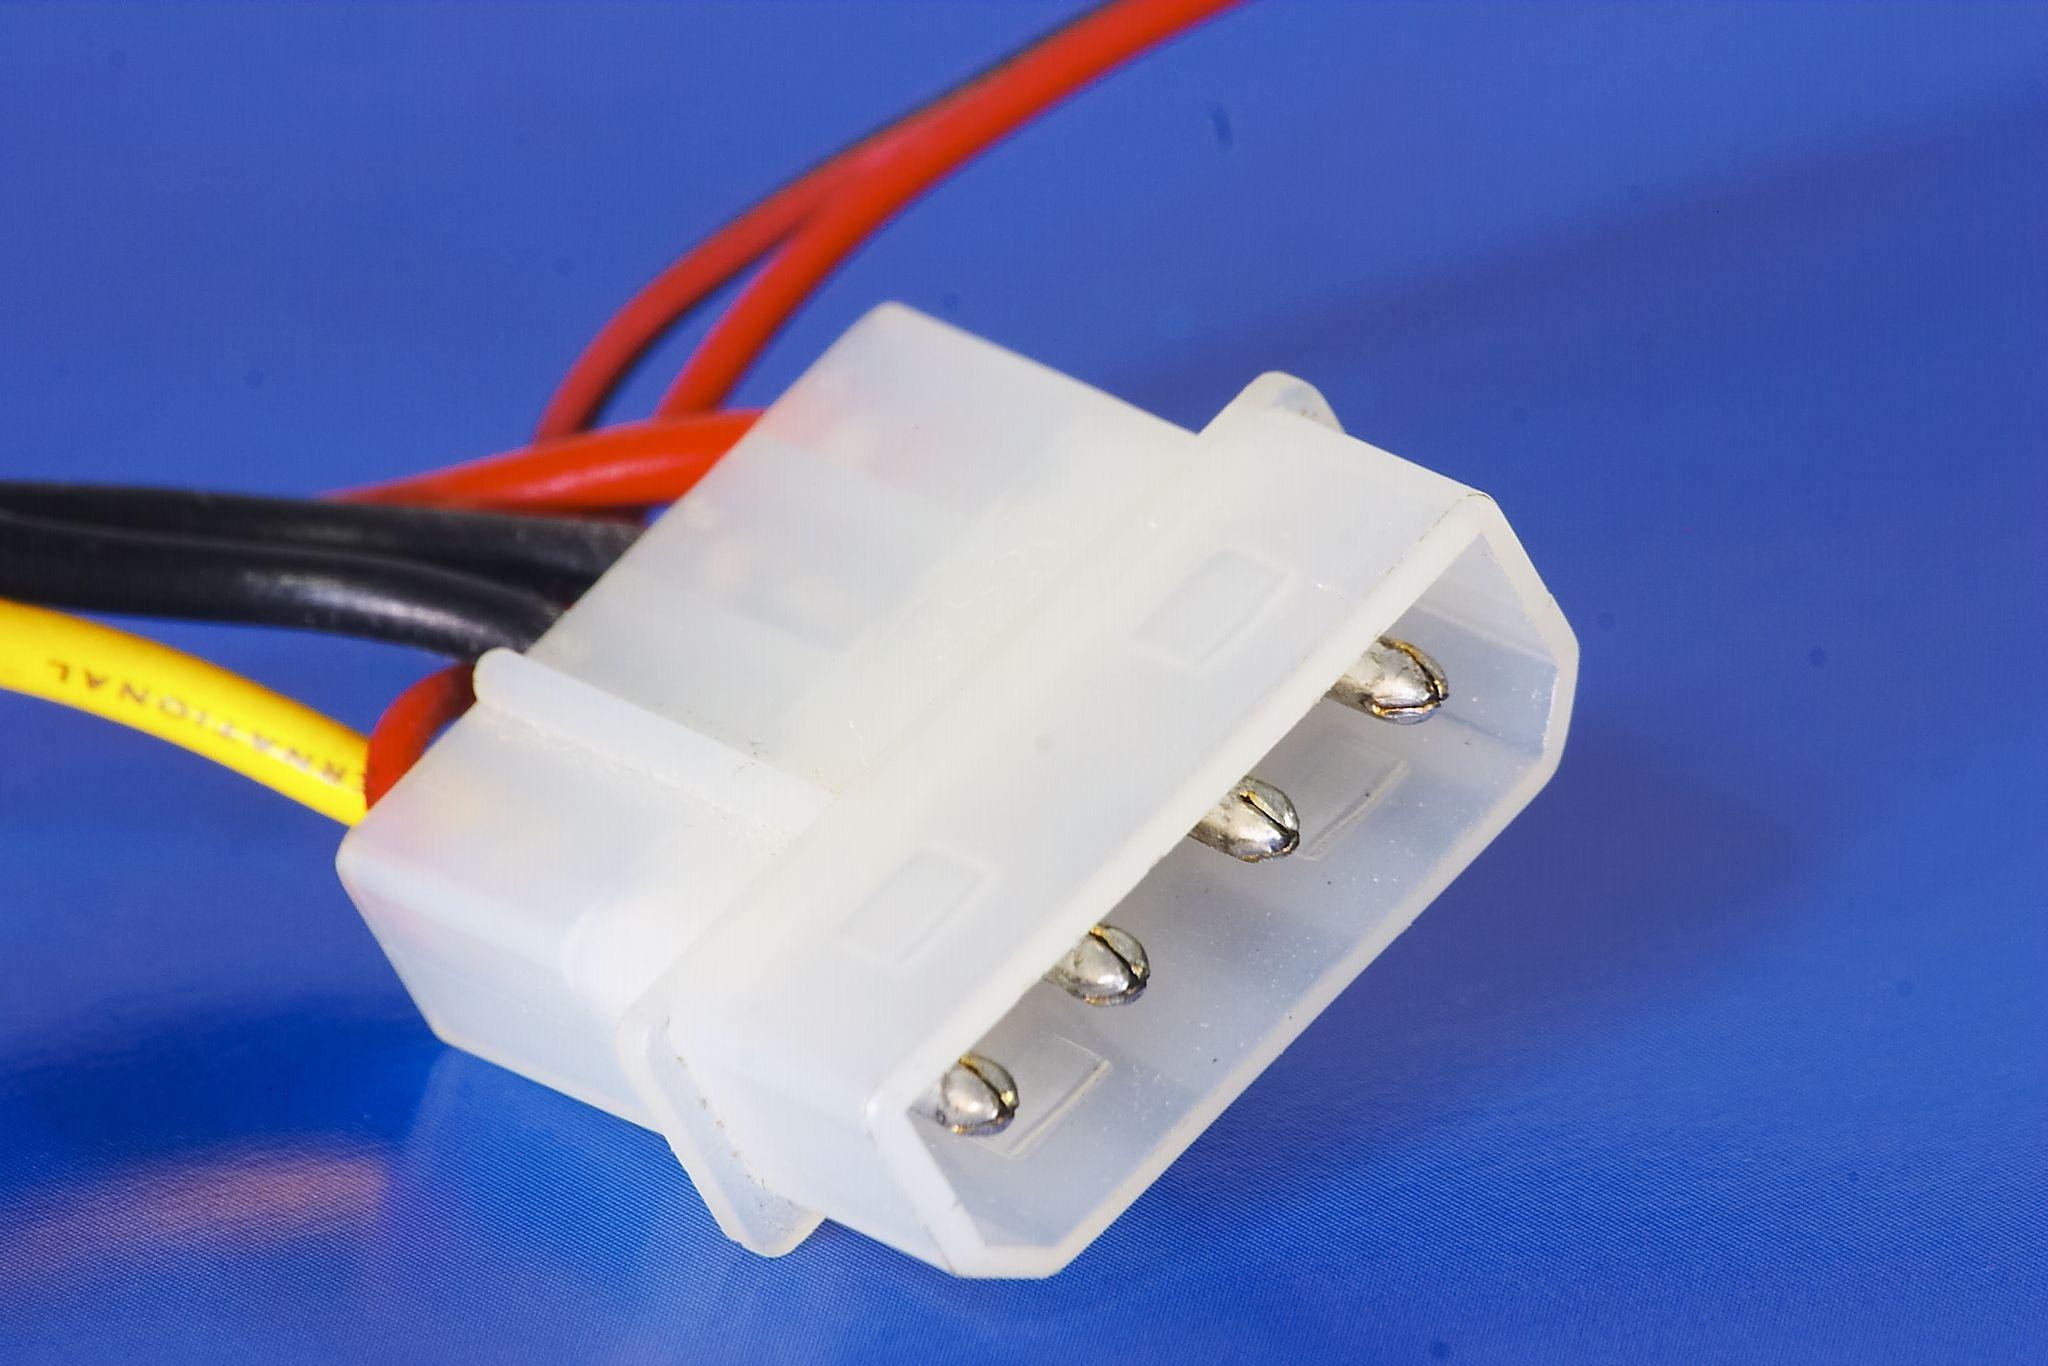 mini usb power wiring diagram profibus 4 pin peripheral connector pinout